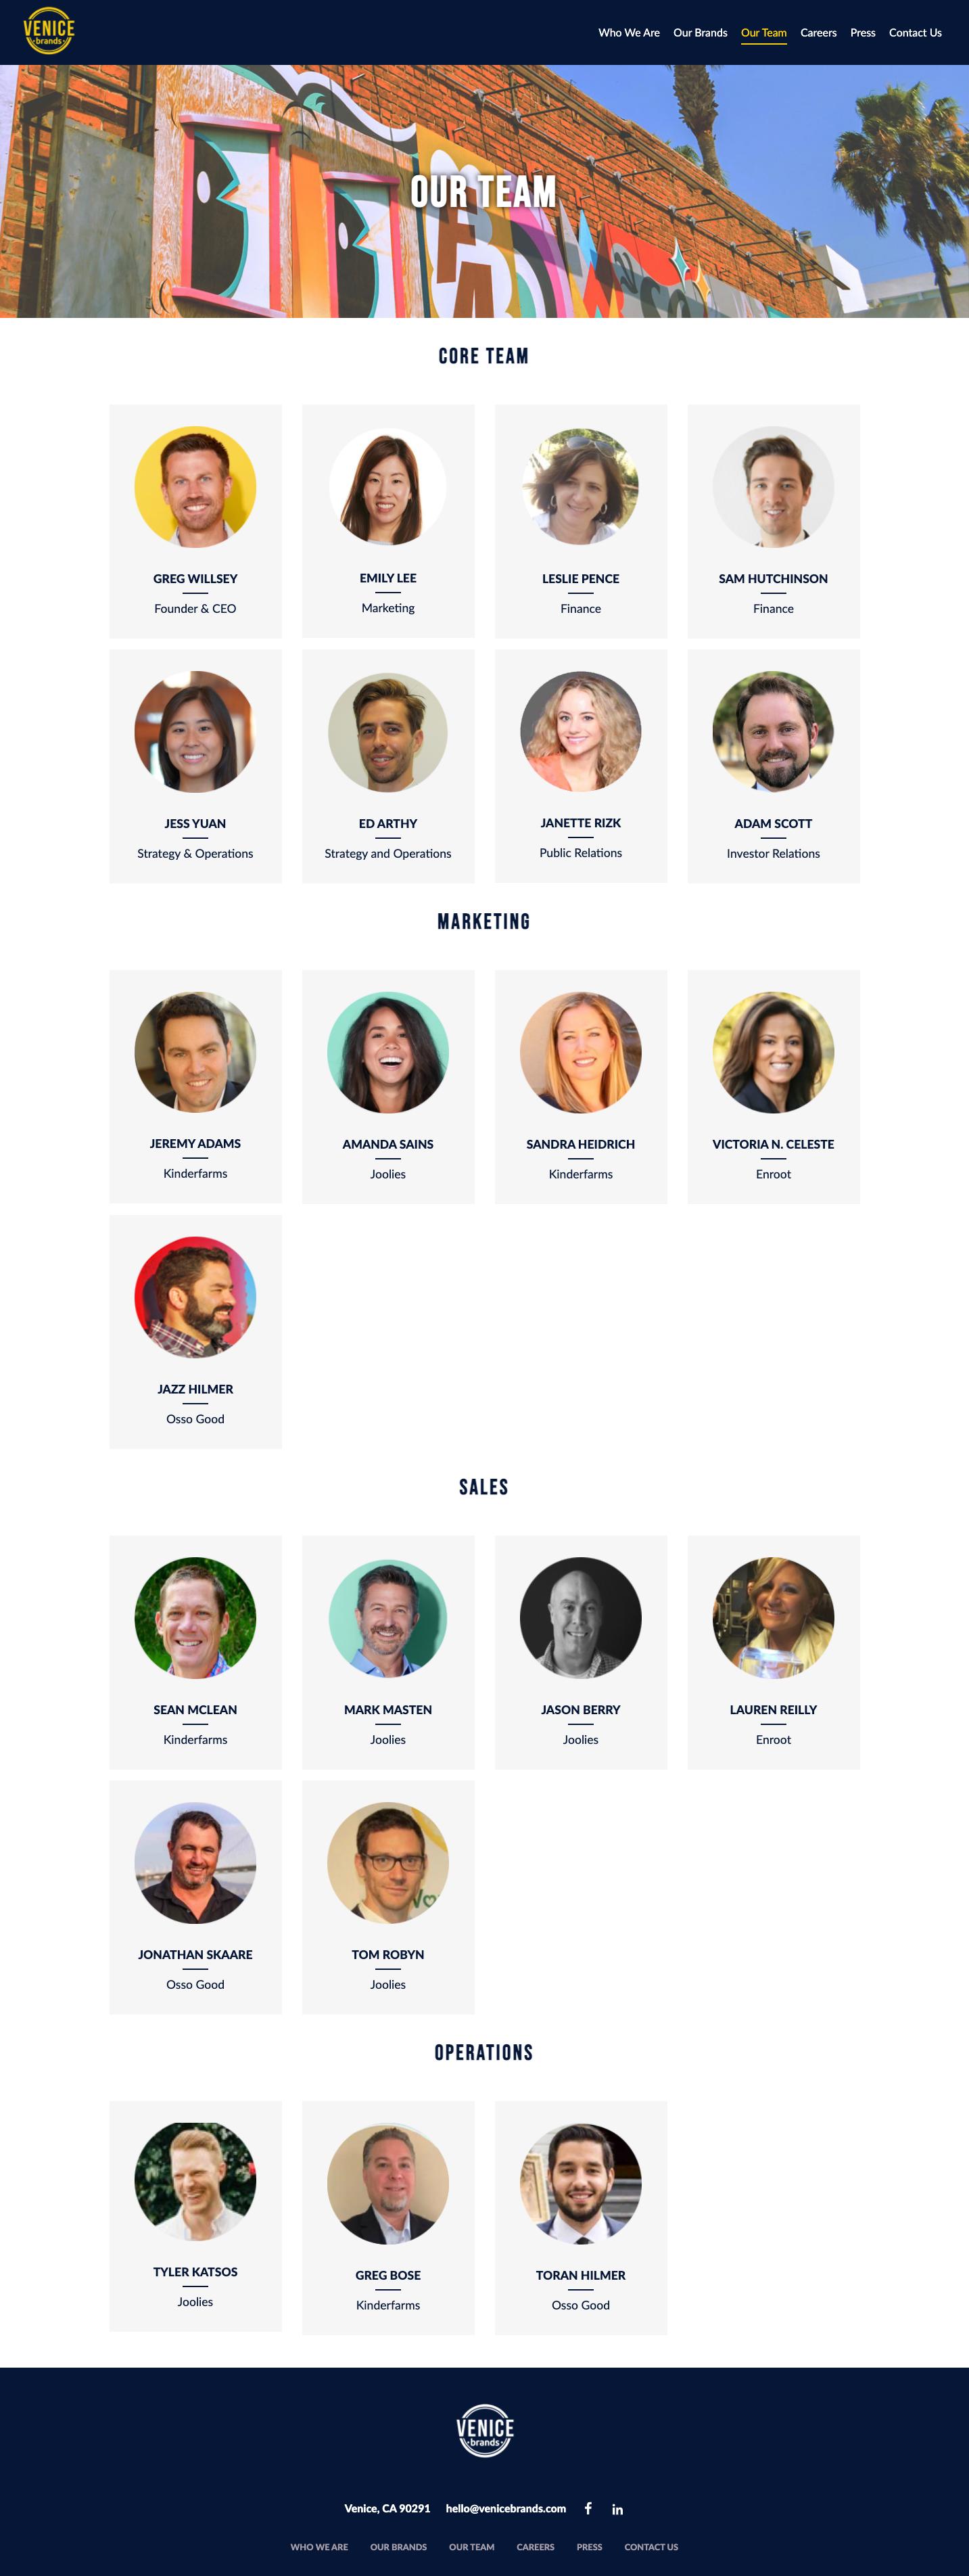 Venice Brands Team Page